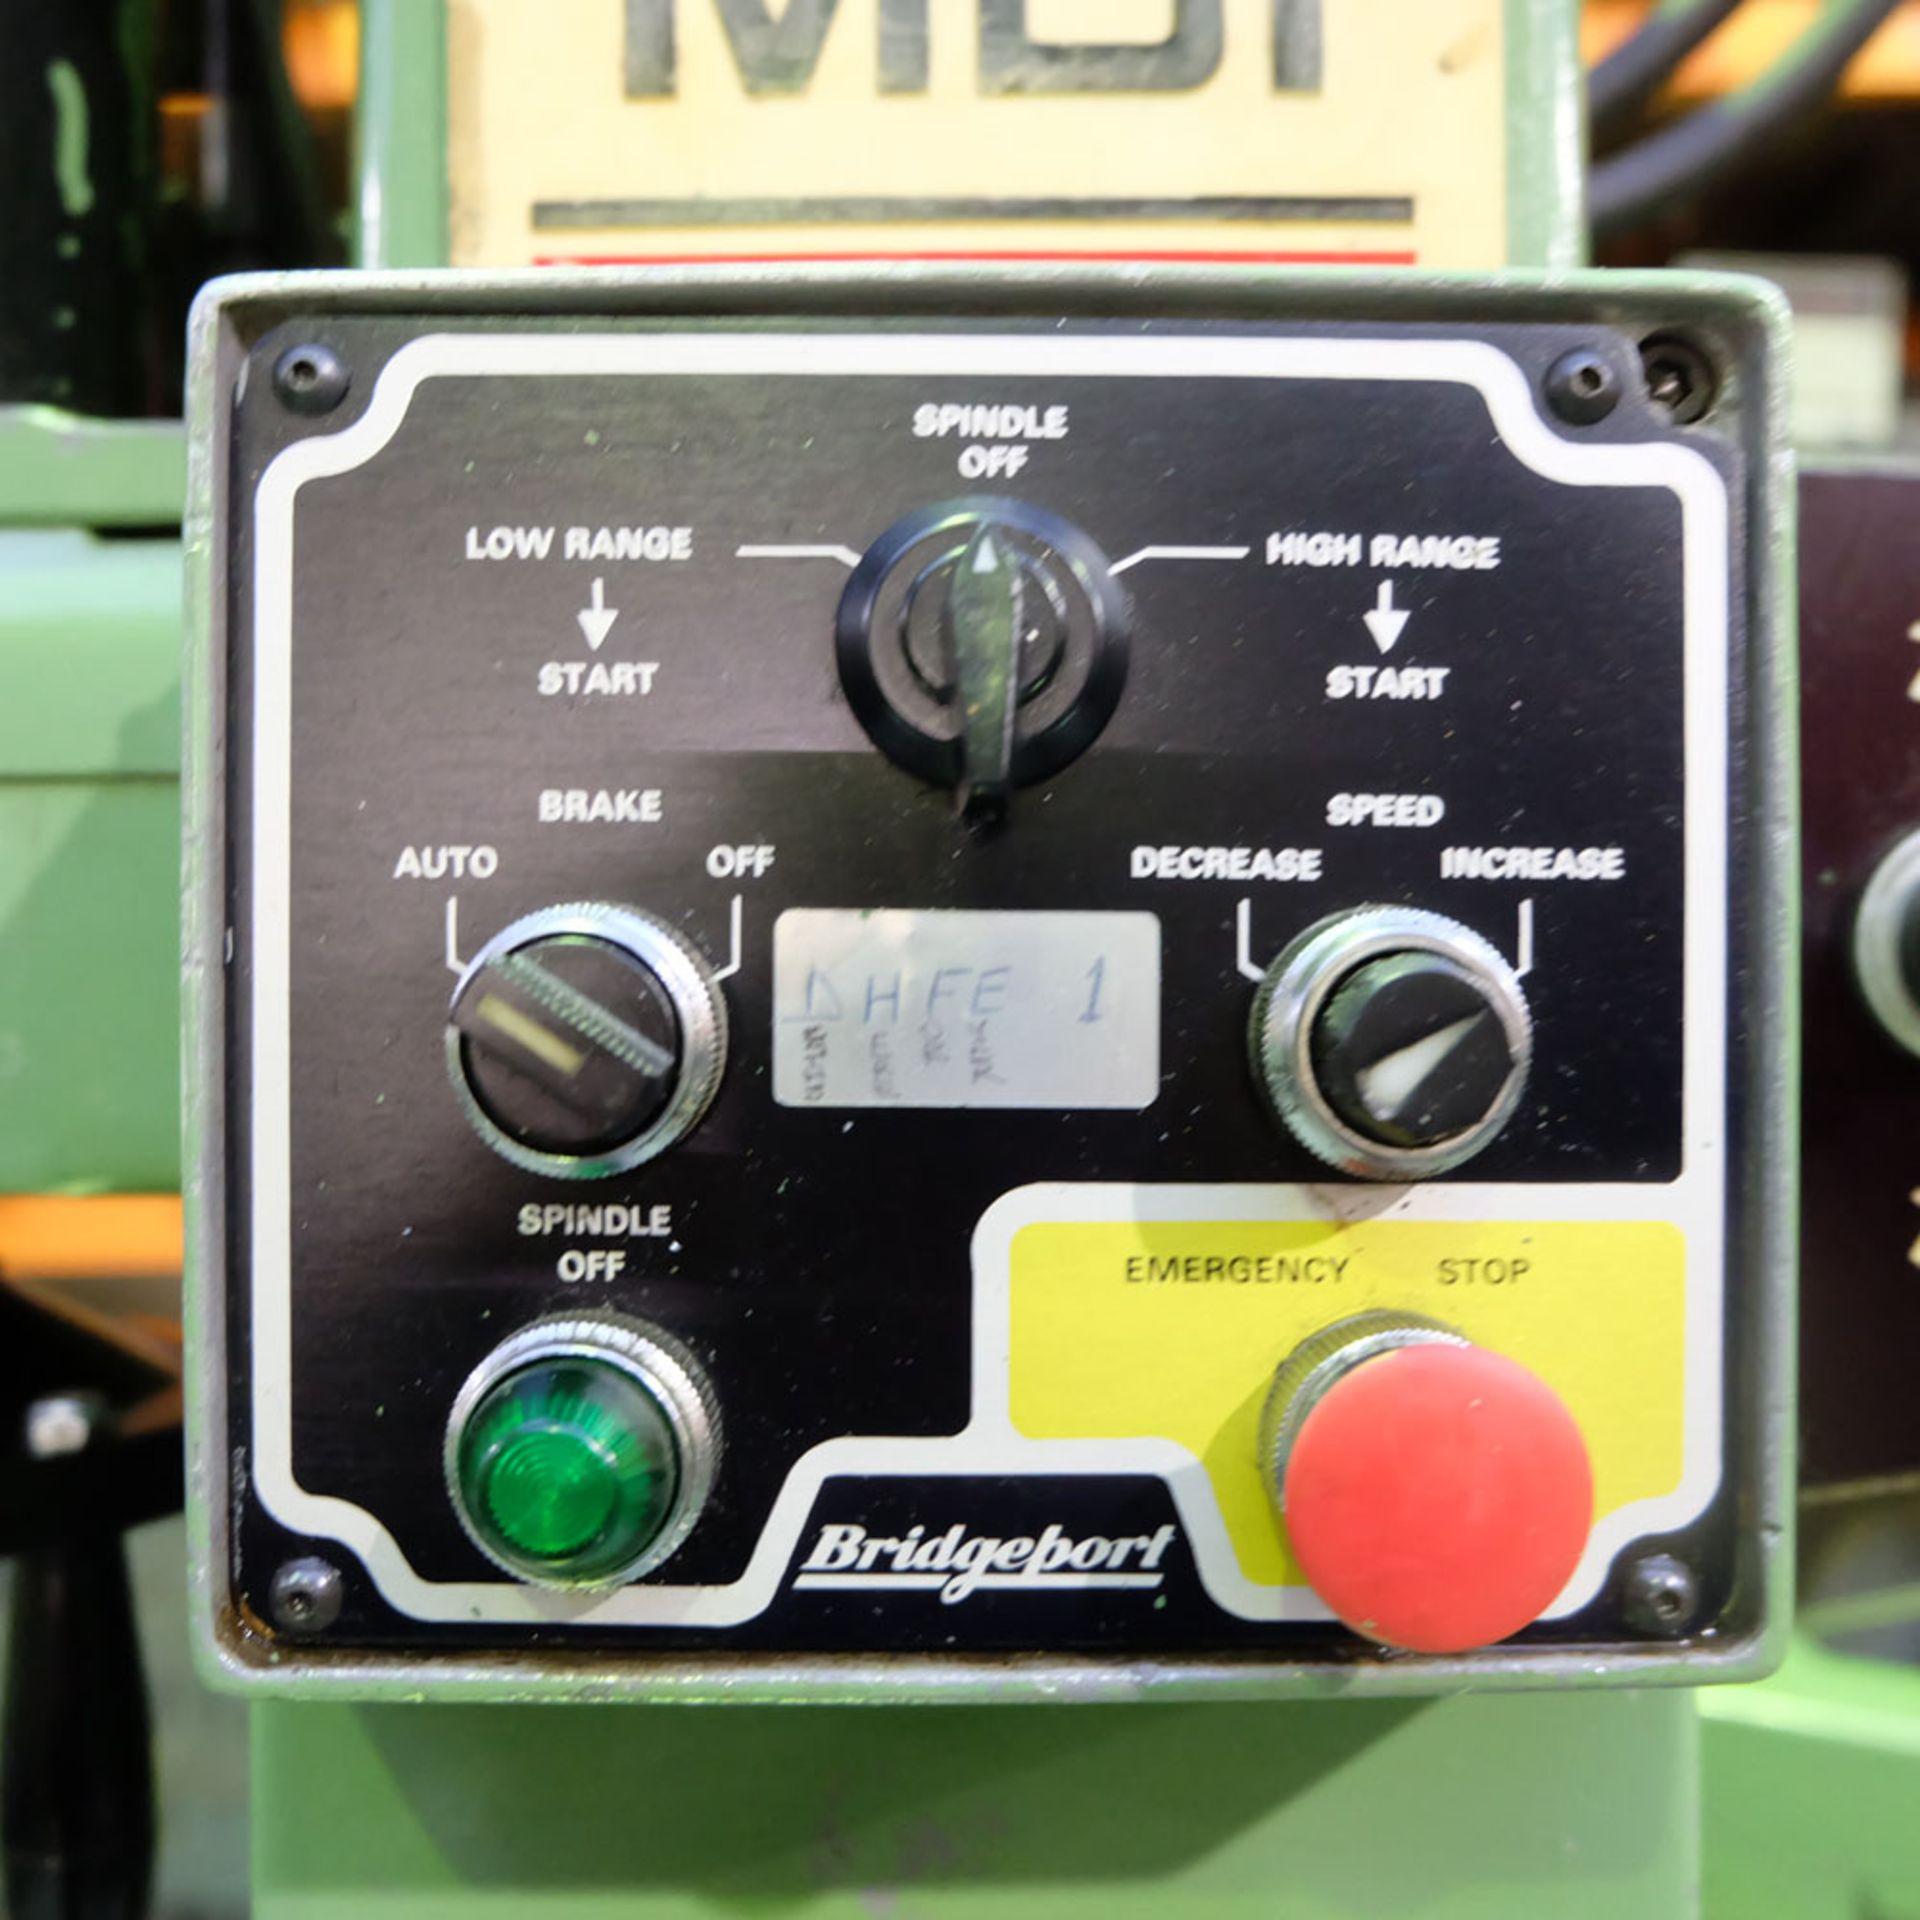 Bridgeport Series 1 MDI. CNC Mill with Heidenhain TNC131 3 Axis Control. - Image 11 of 14